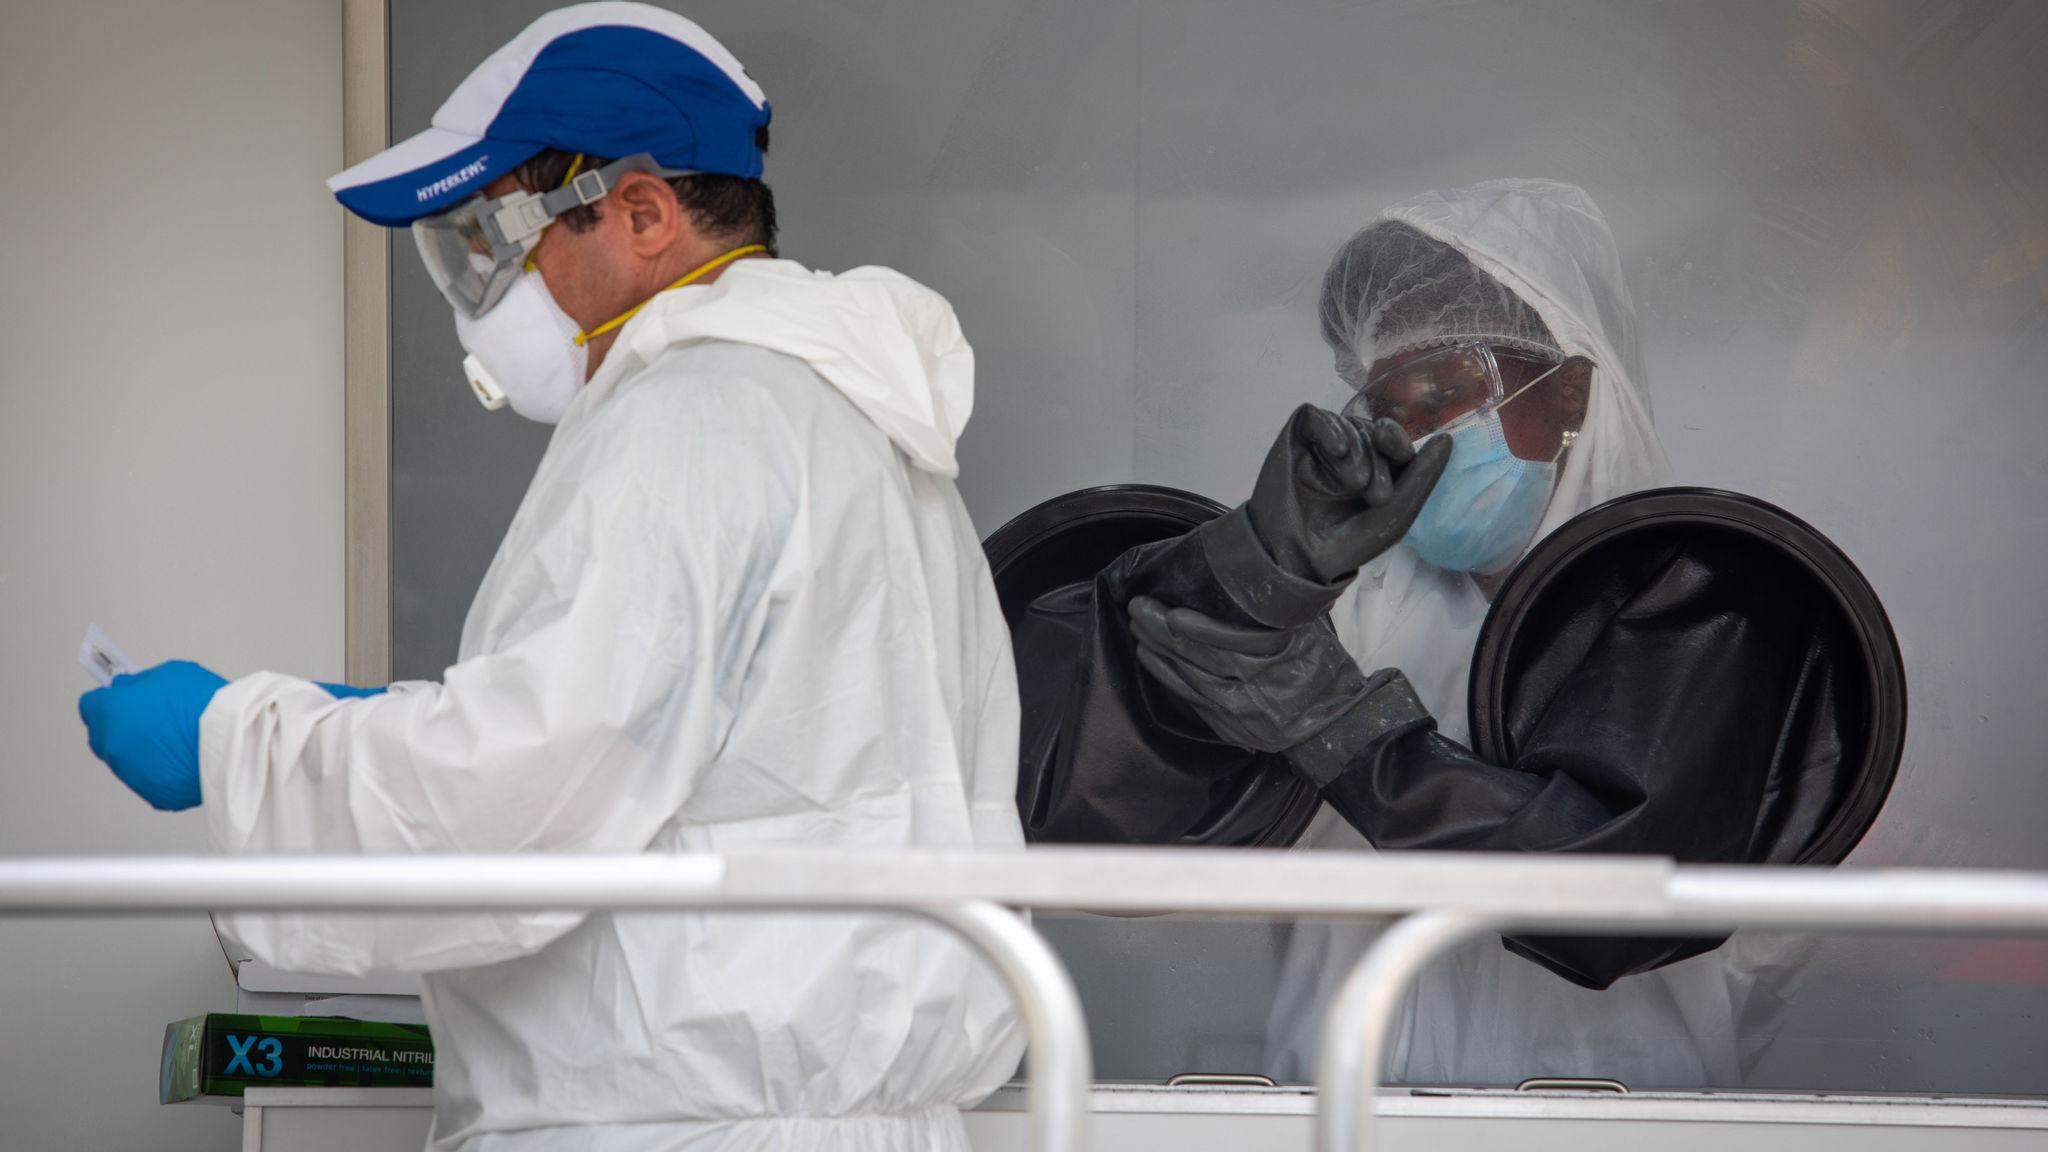 New Lockdowns Are Threatened in Virus-Stricken U.S. States